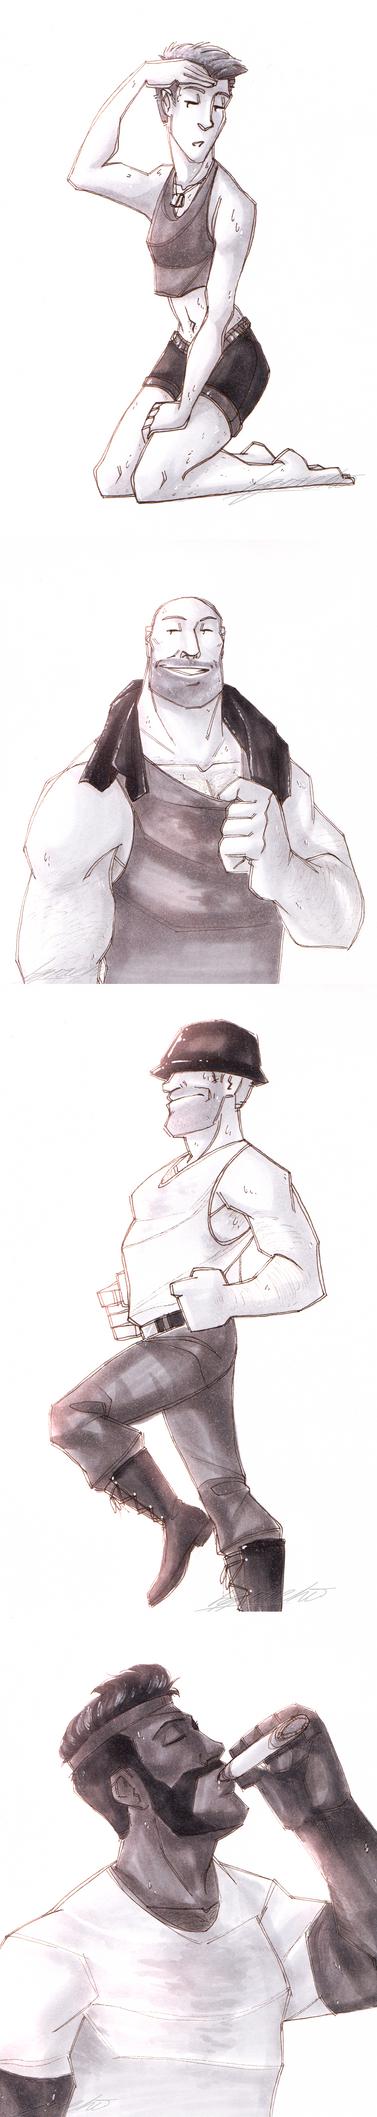 Gotta take care of the shape by Nara-chann